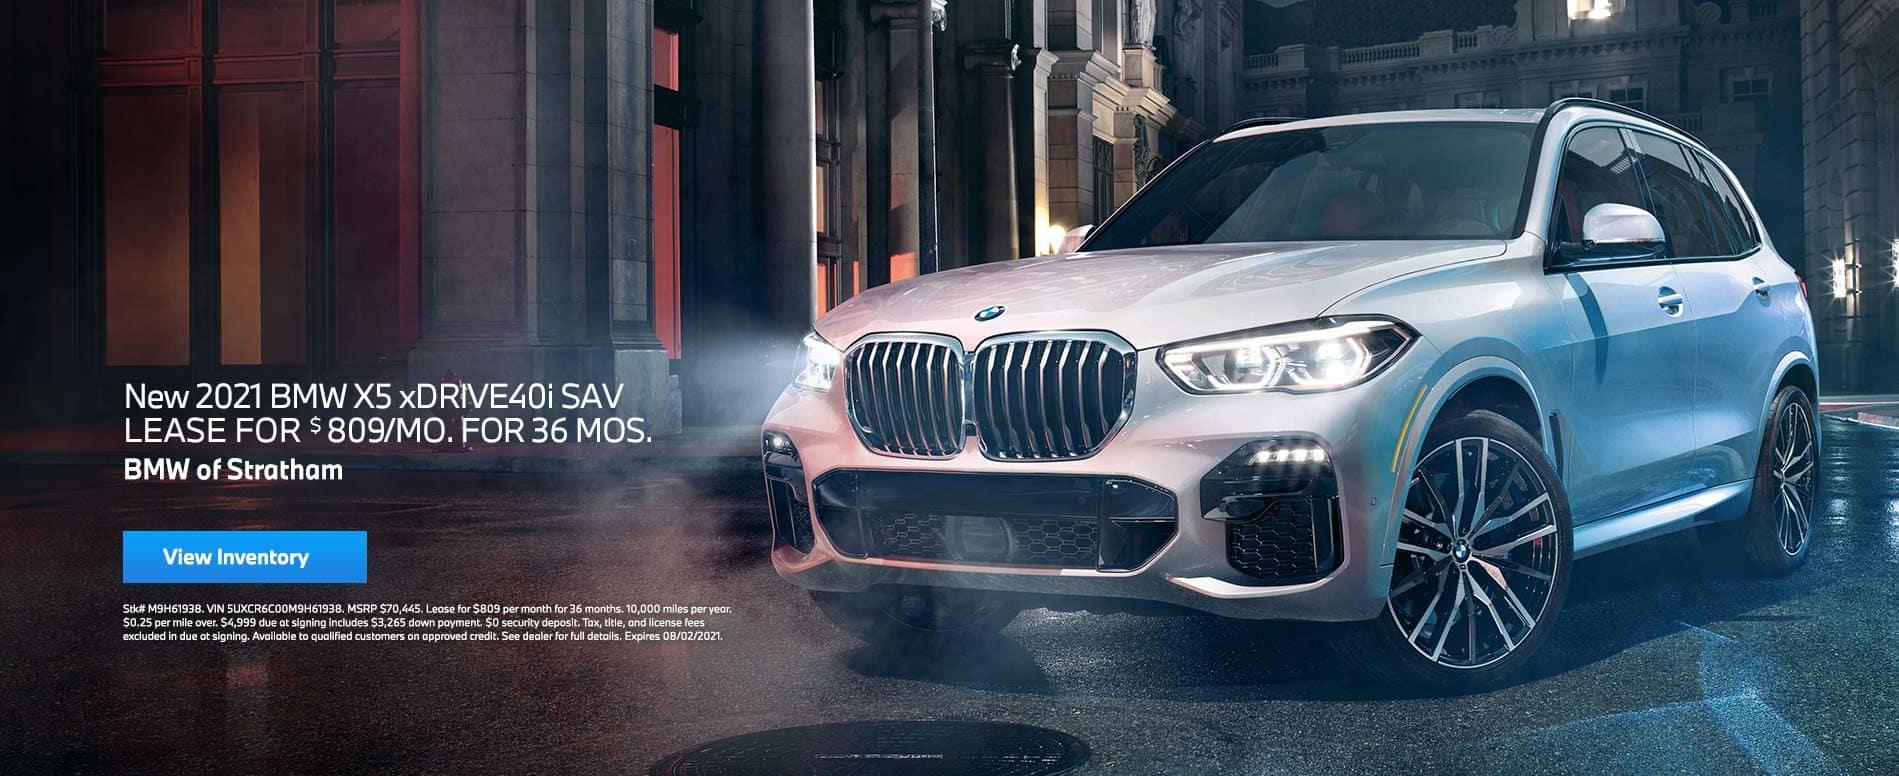 BMWStratham_Slide_1990x776_X5_7-2021